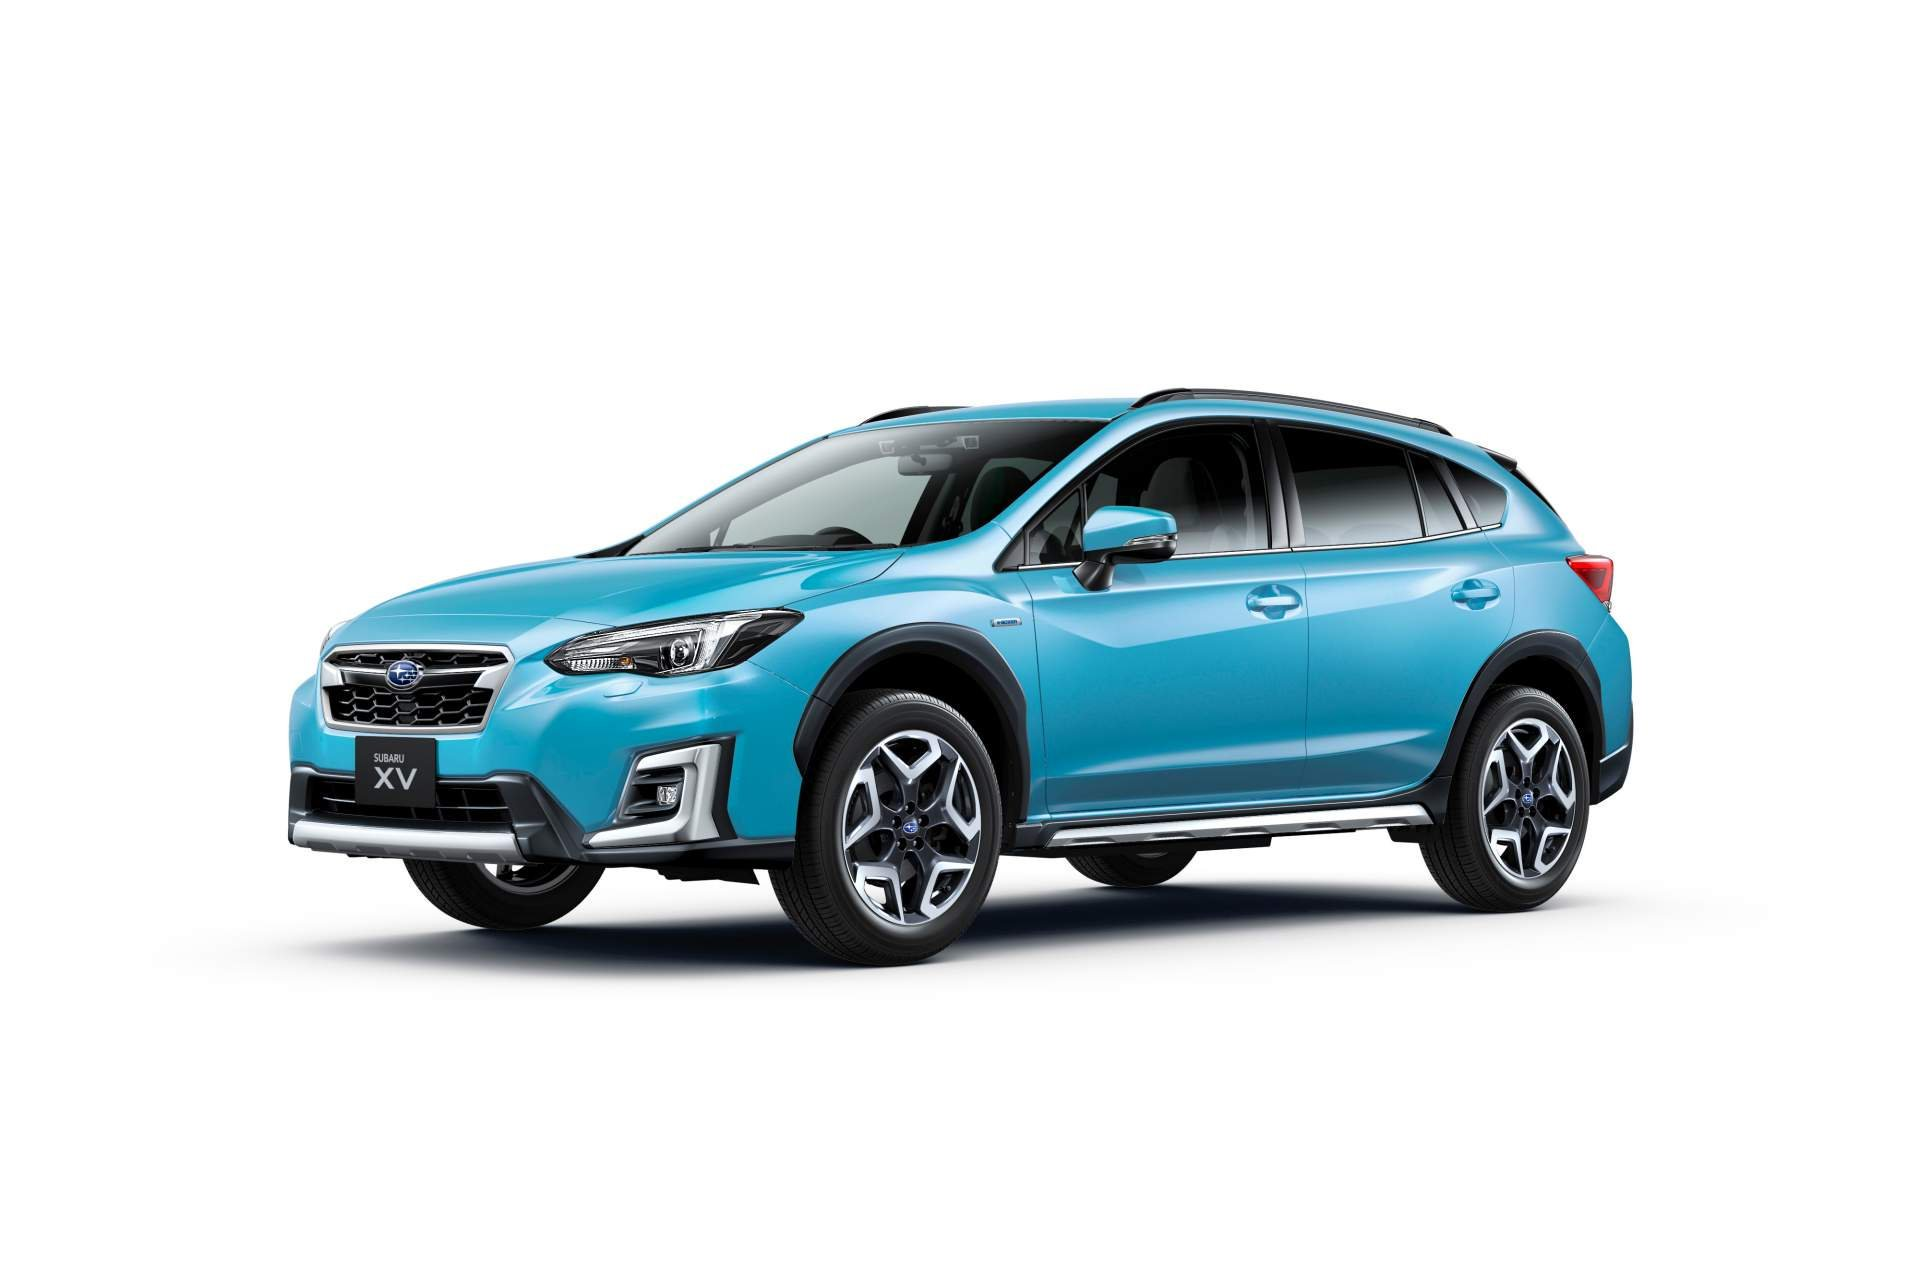 Subaru Xv Hybrid 0918 01